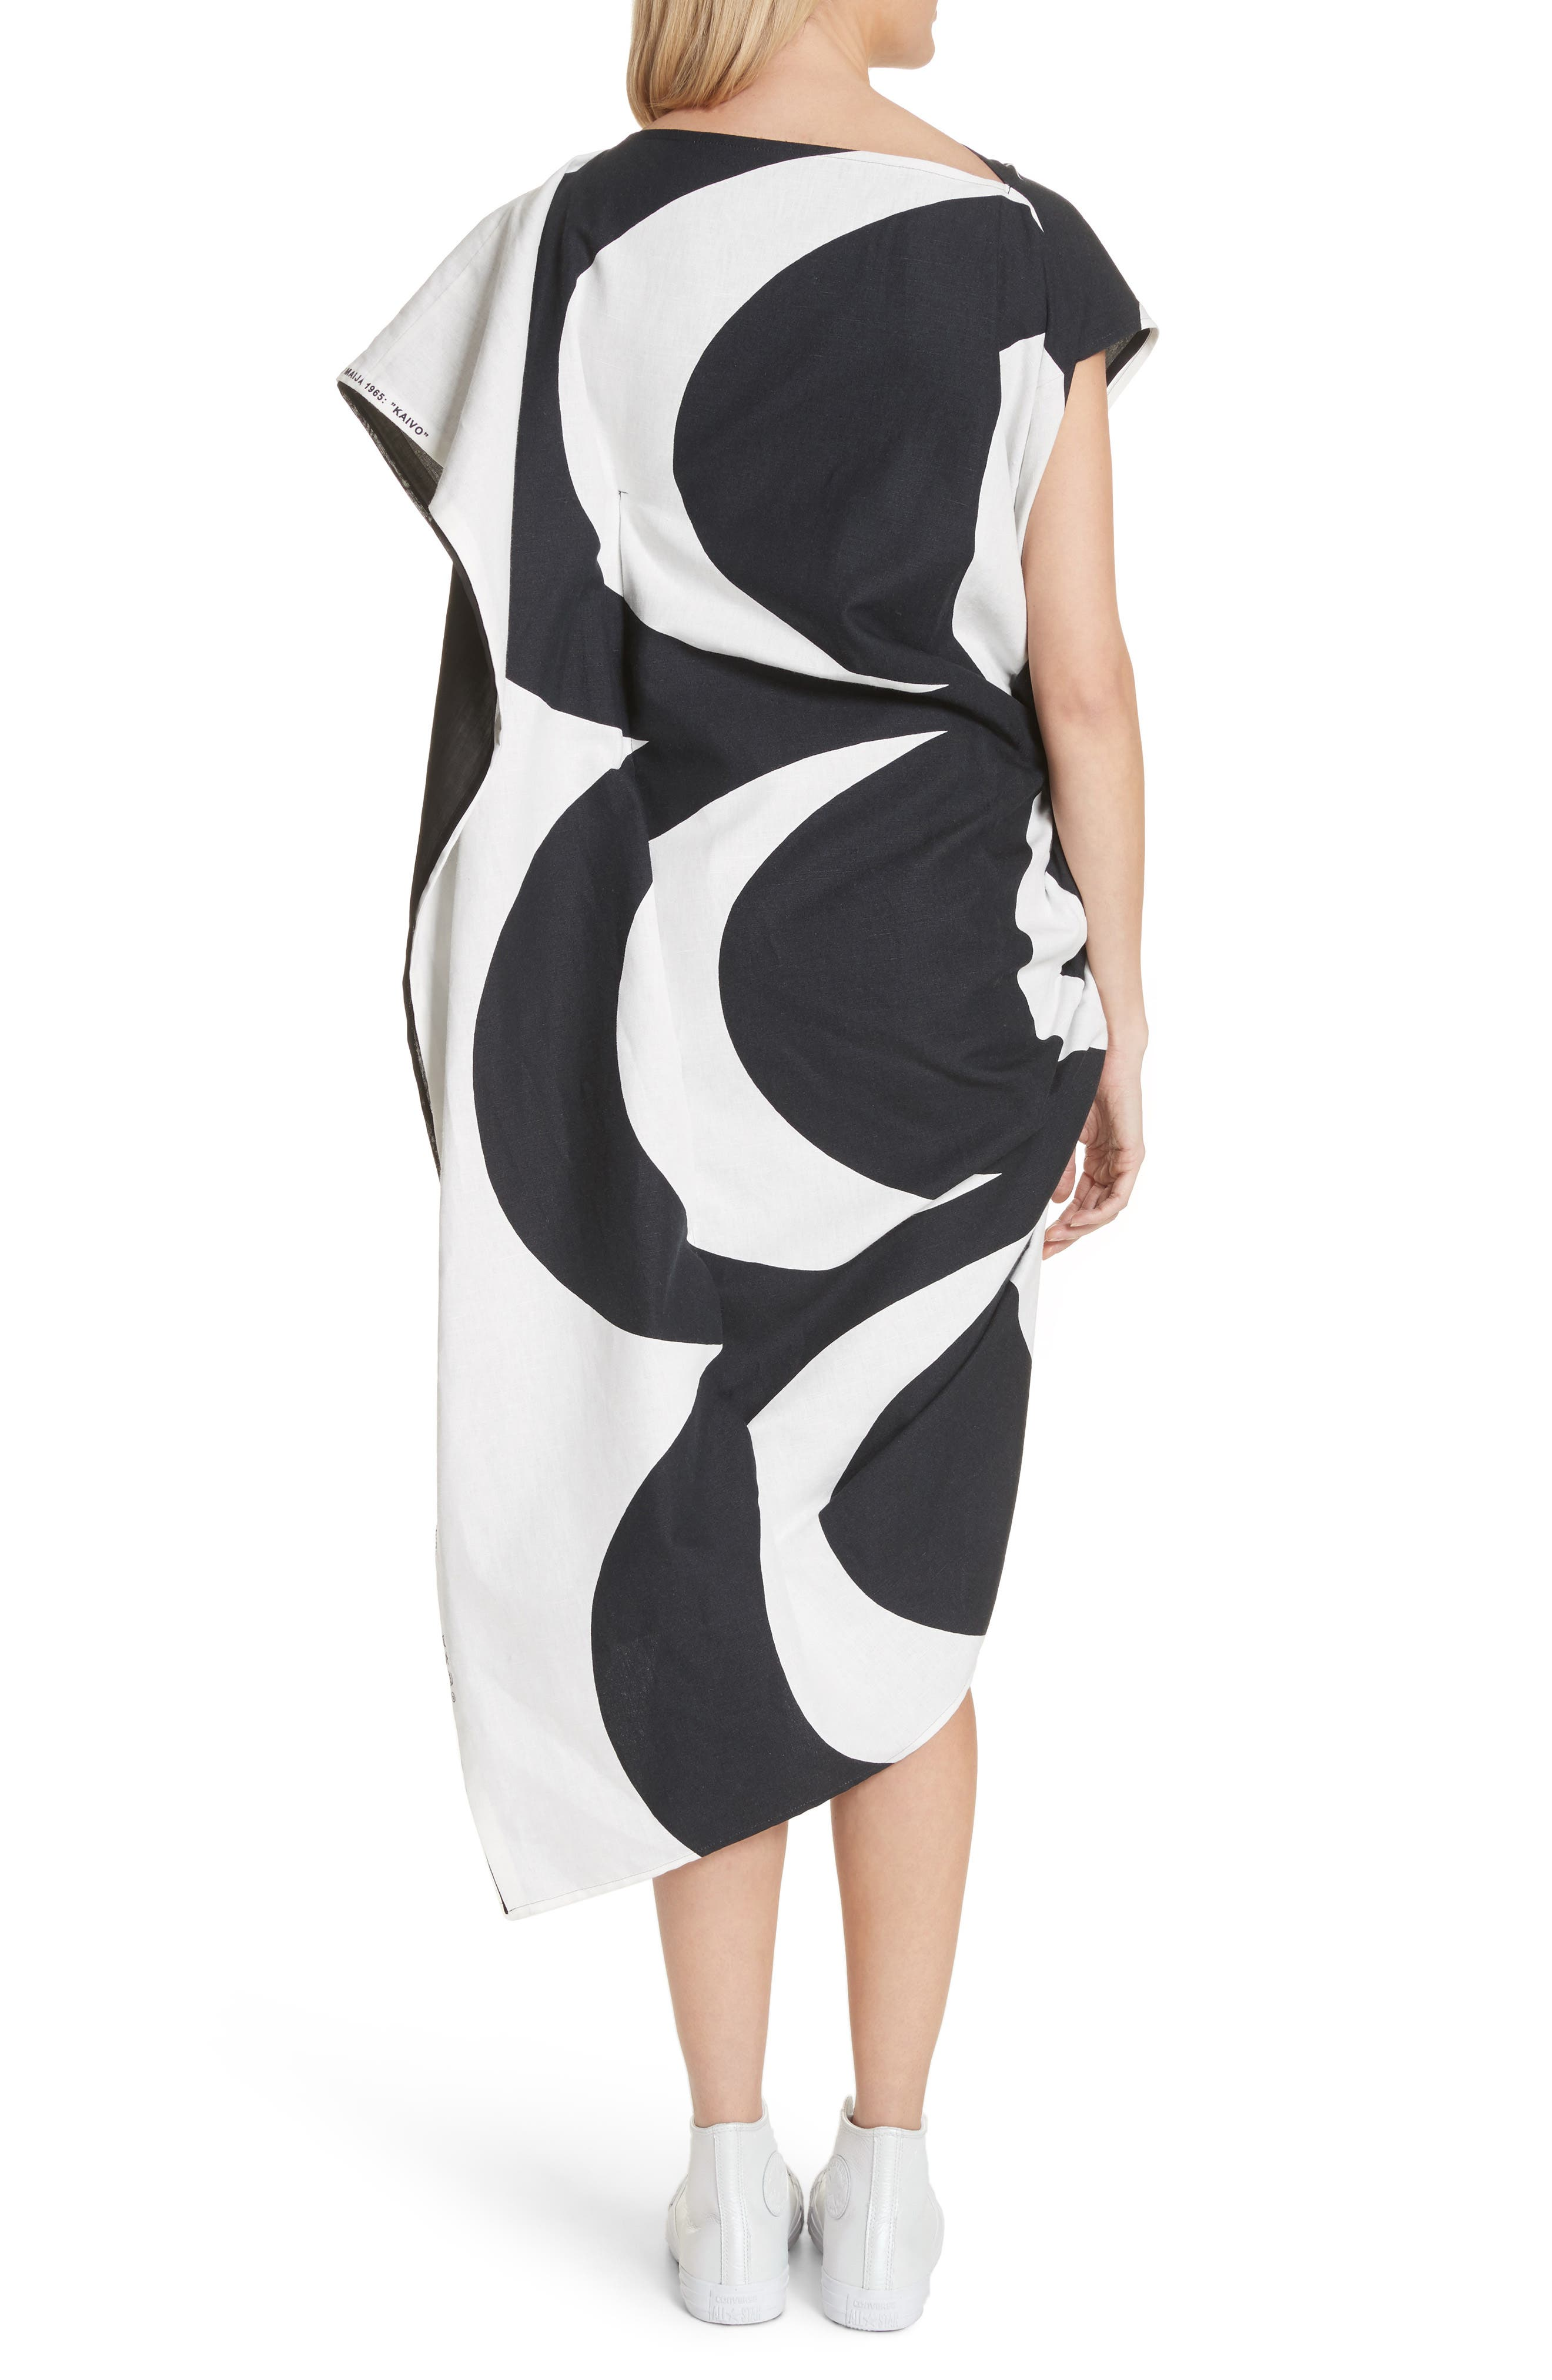 Circular Print Asymmetrical Draped Dress,                             Alternate thumbnail 2, color,                             Wht/ Blk X Blk